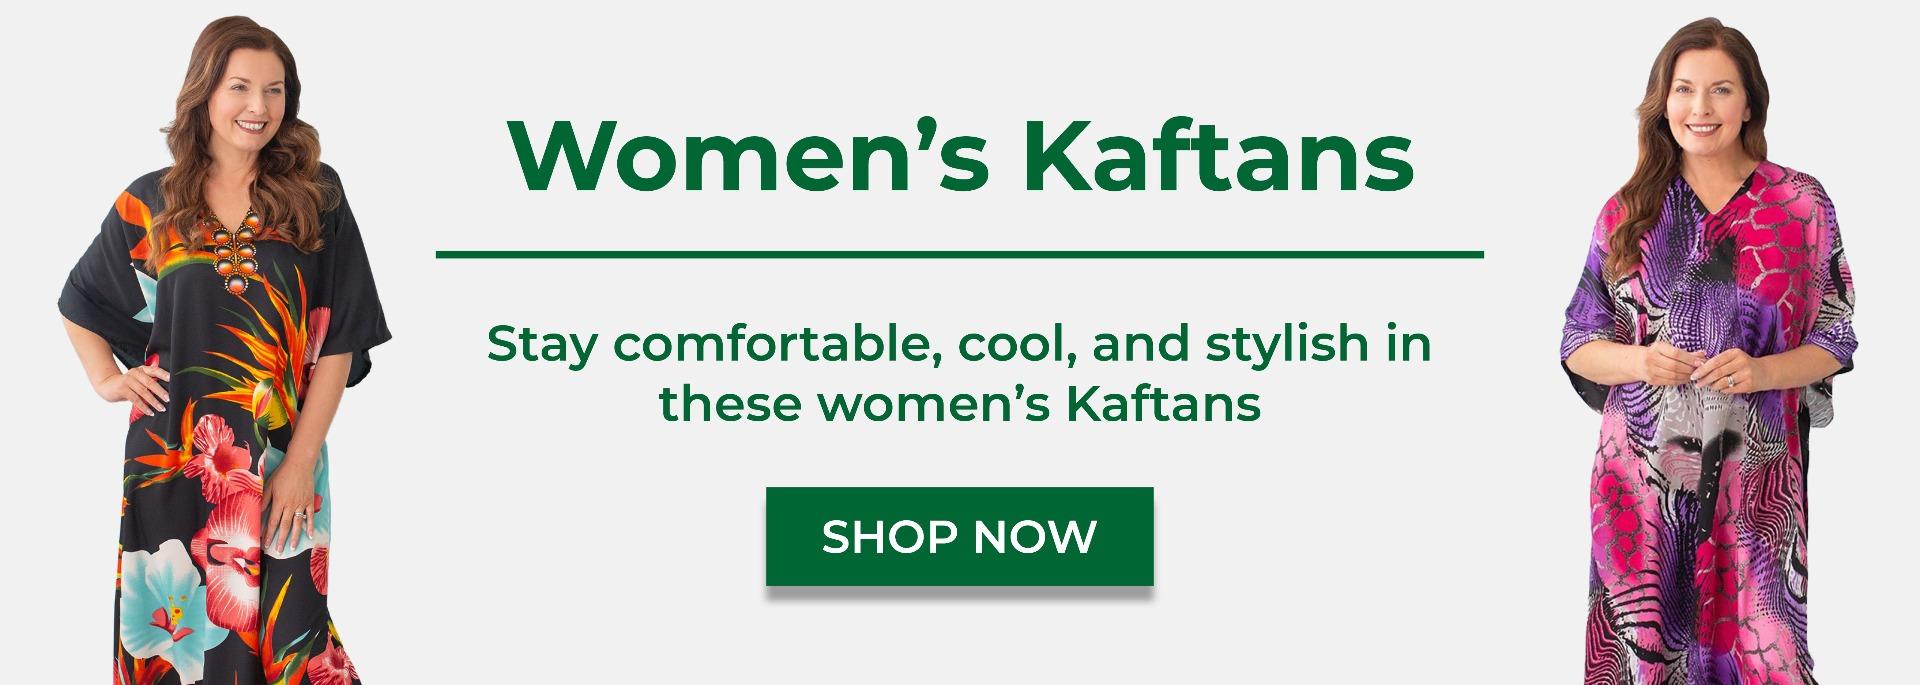 Shop Kaftans